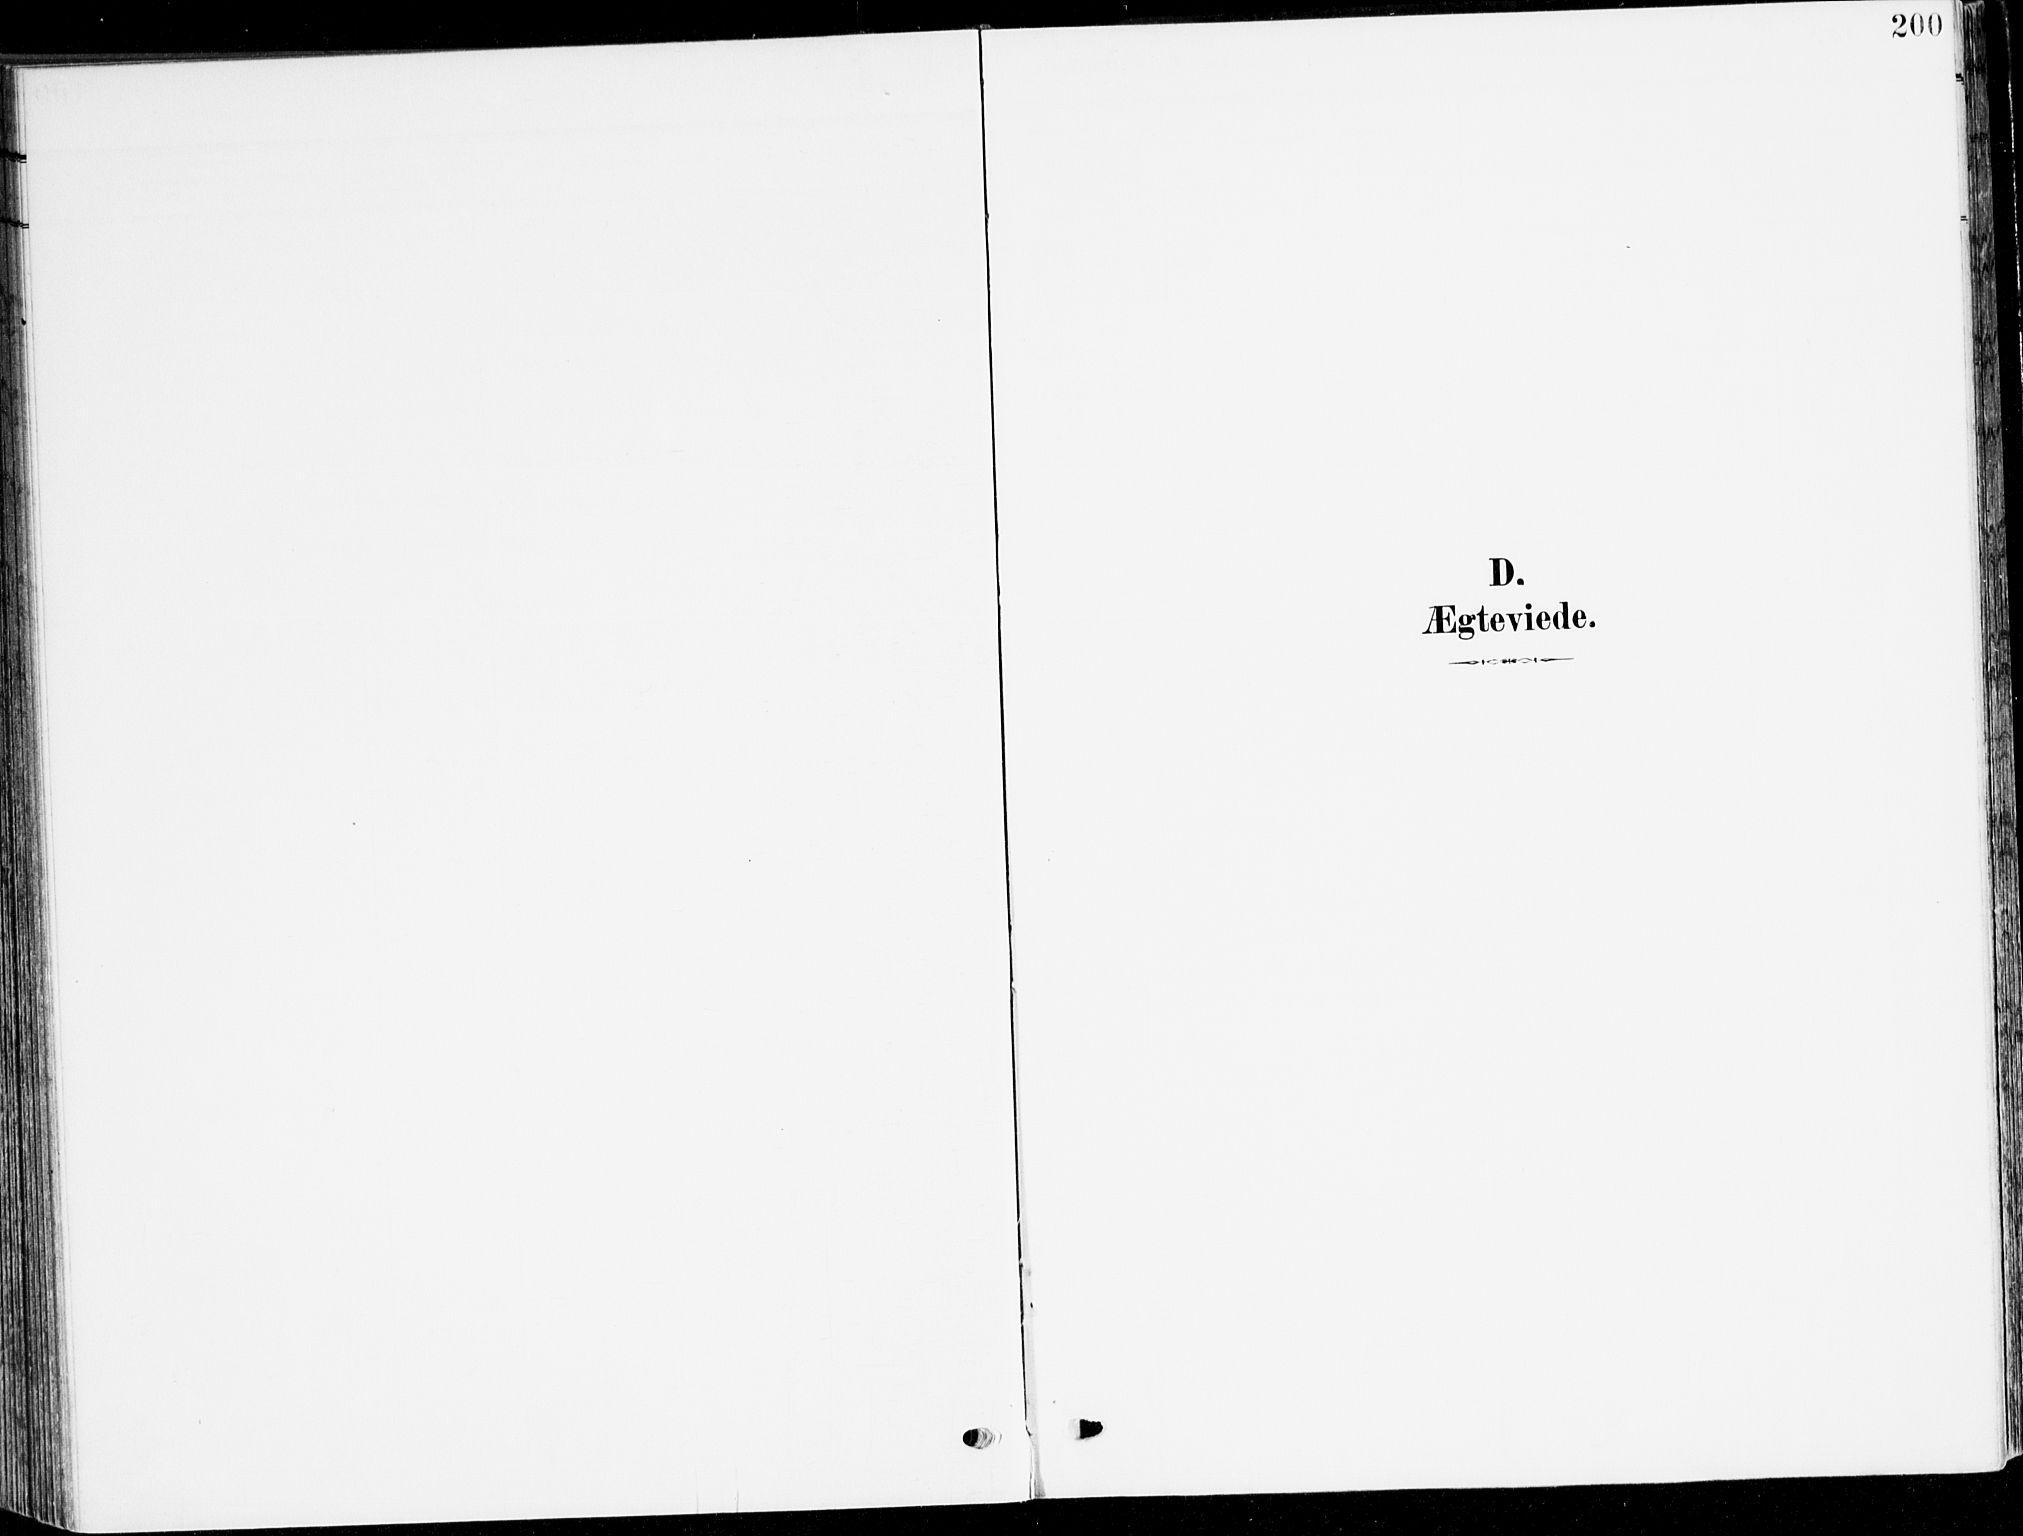 SAB, Selje sokneprestembete*, Ministerialbok nr. B 3, 1908-1923, s. 200